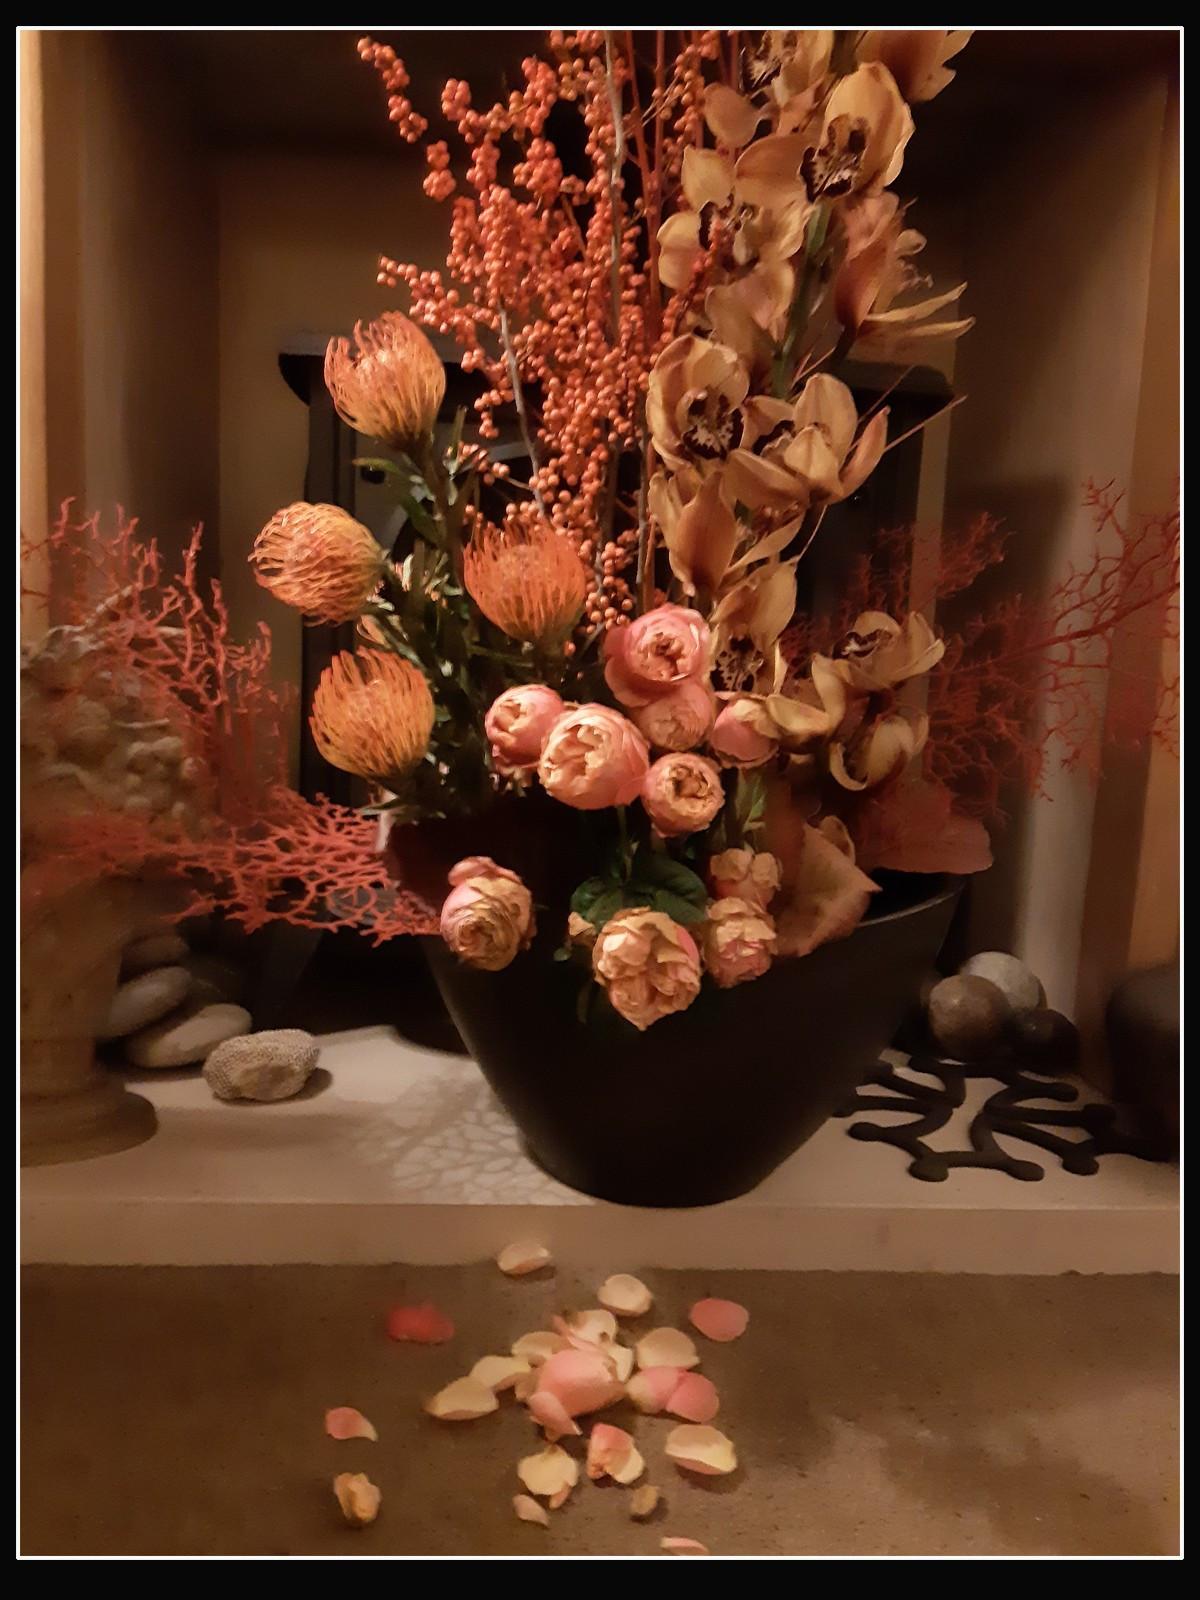 20.When petals start to fall...